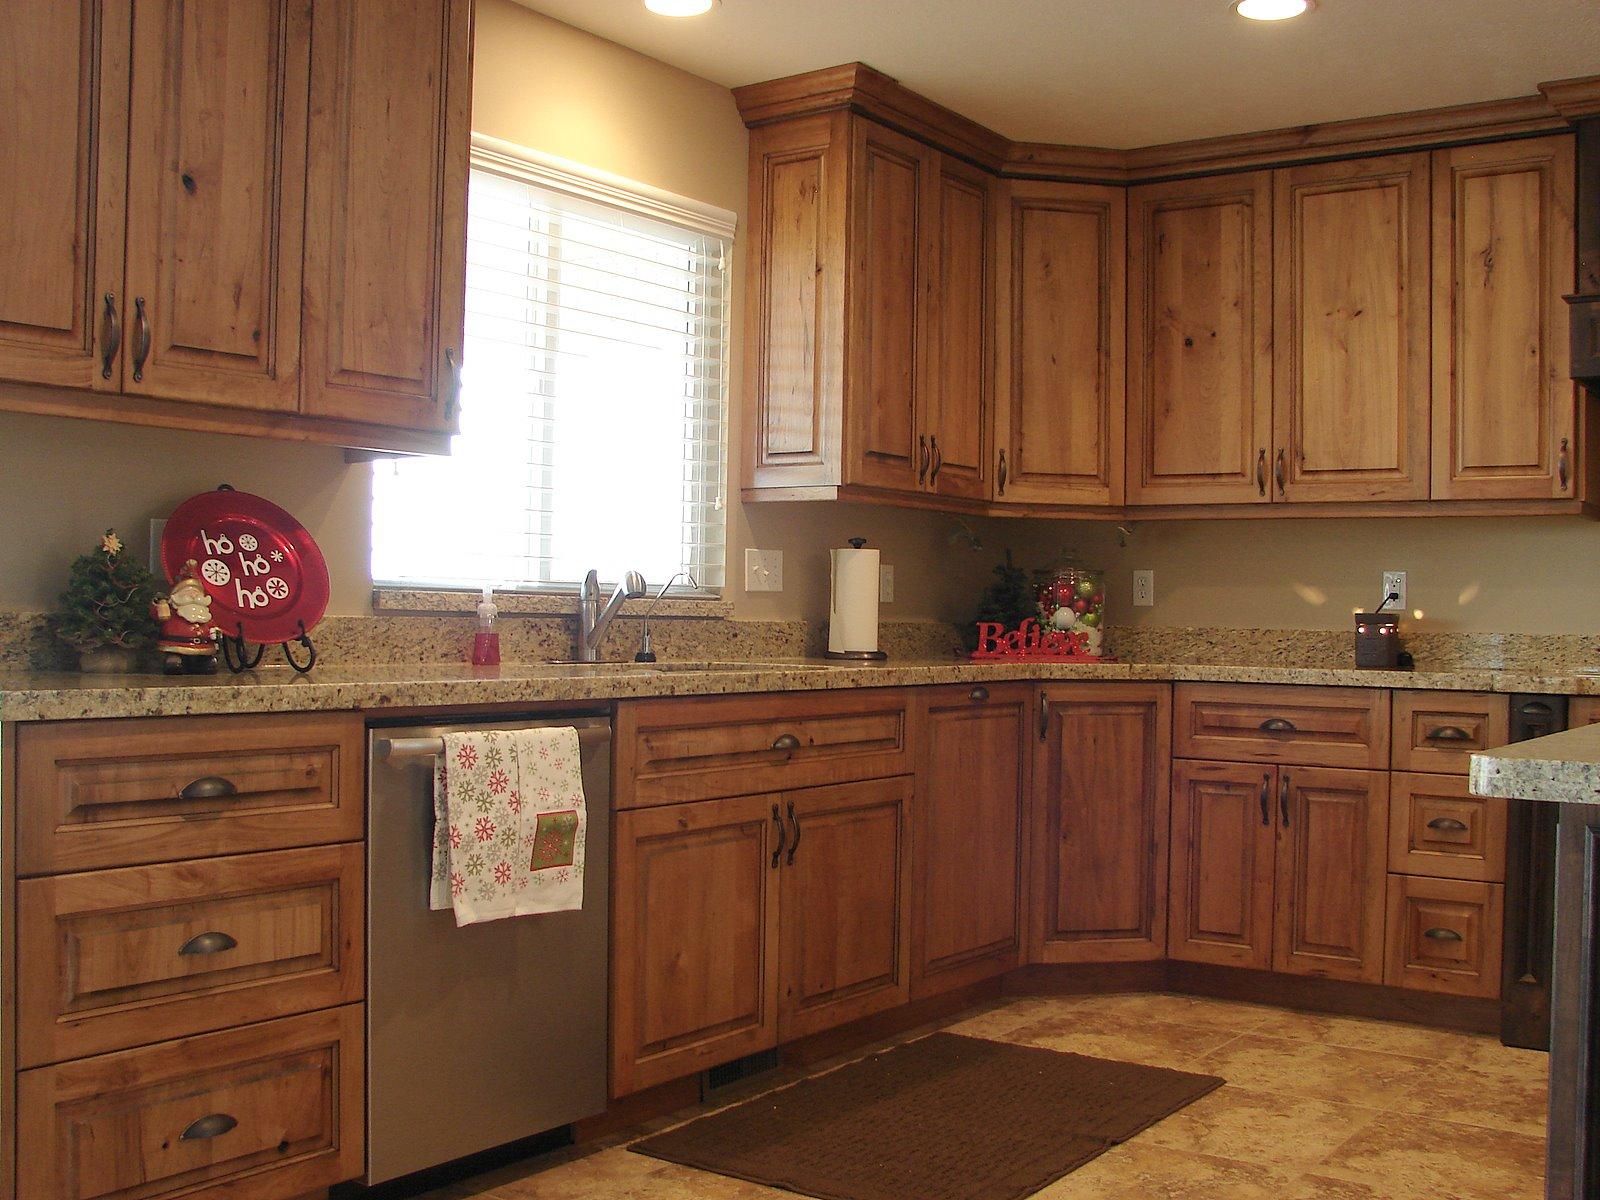 kitchen backsplash cherry cabinets kitchen remodeling granite tile cherry wood cabinets kitchen Home Cabinets American Cherry